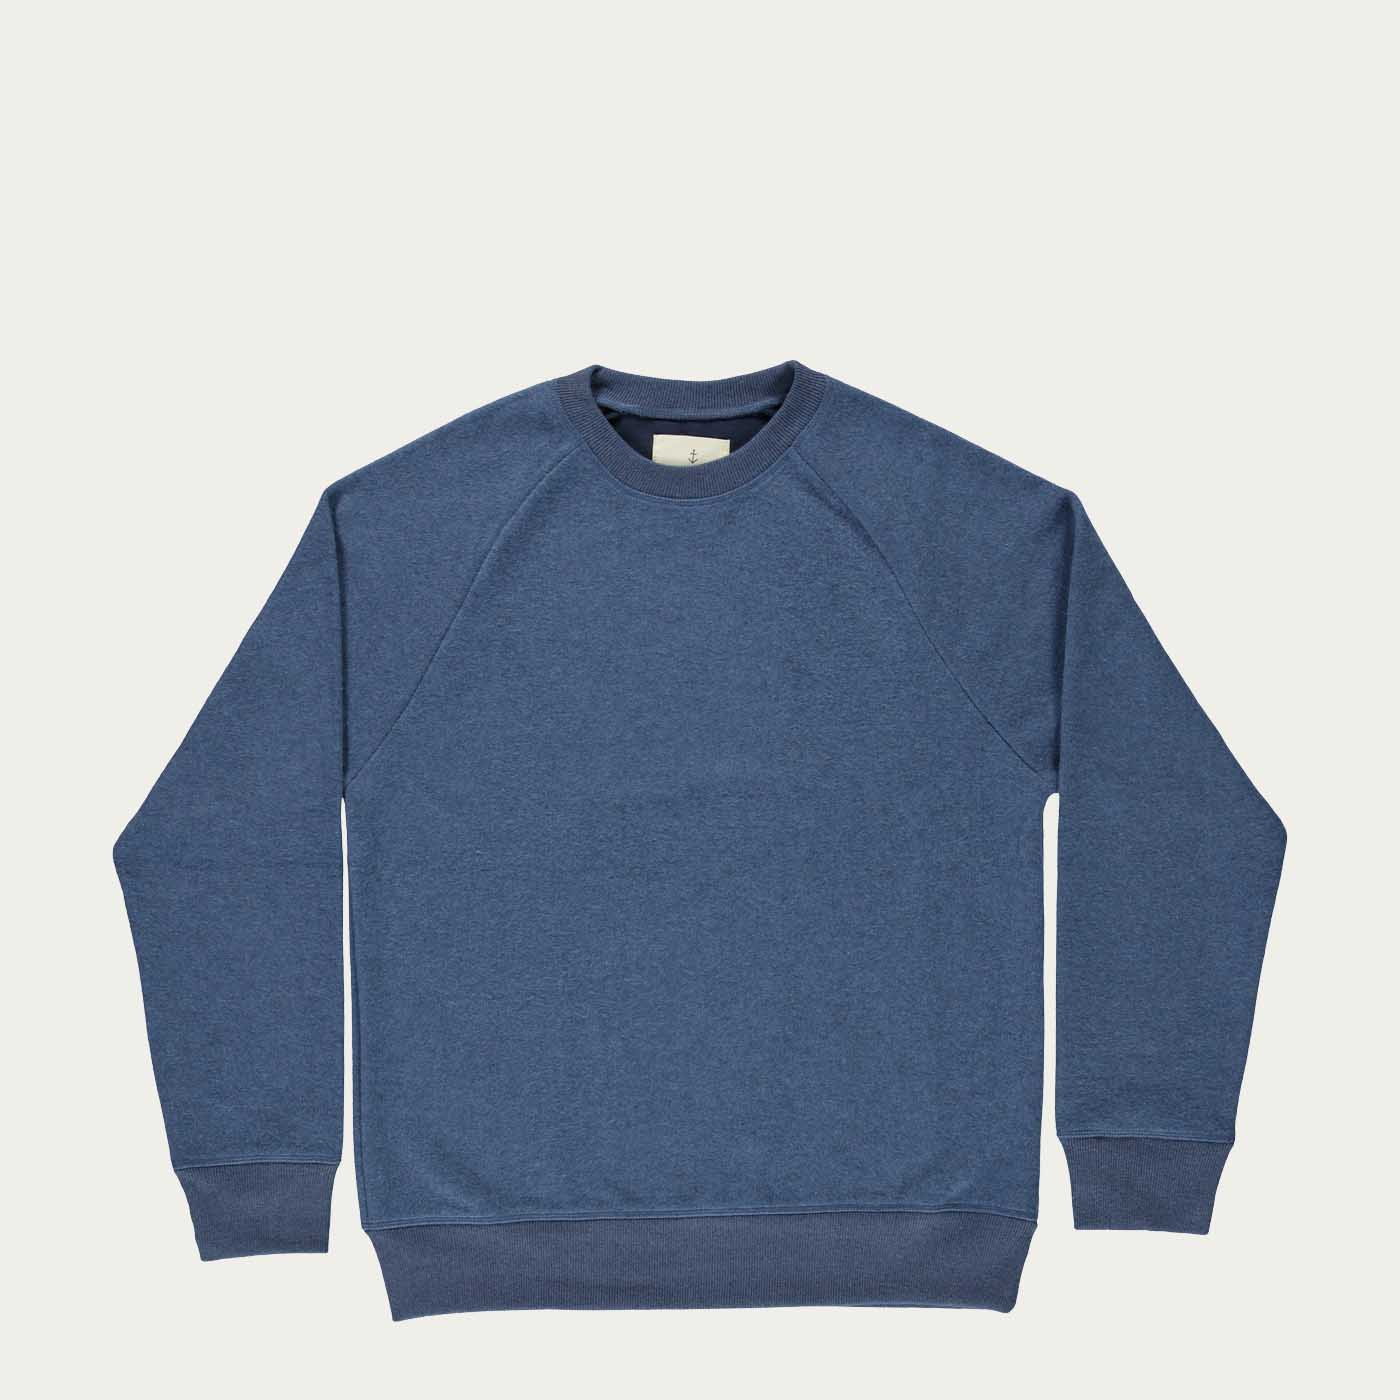 Soft Blue Felpa Cunha Sweatshirt   Bombinate